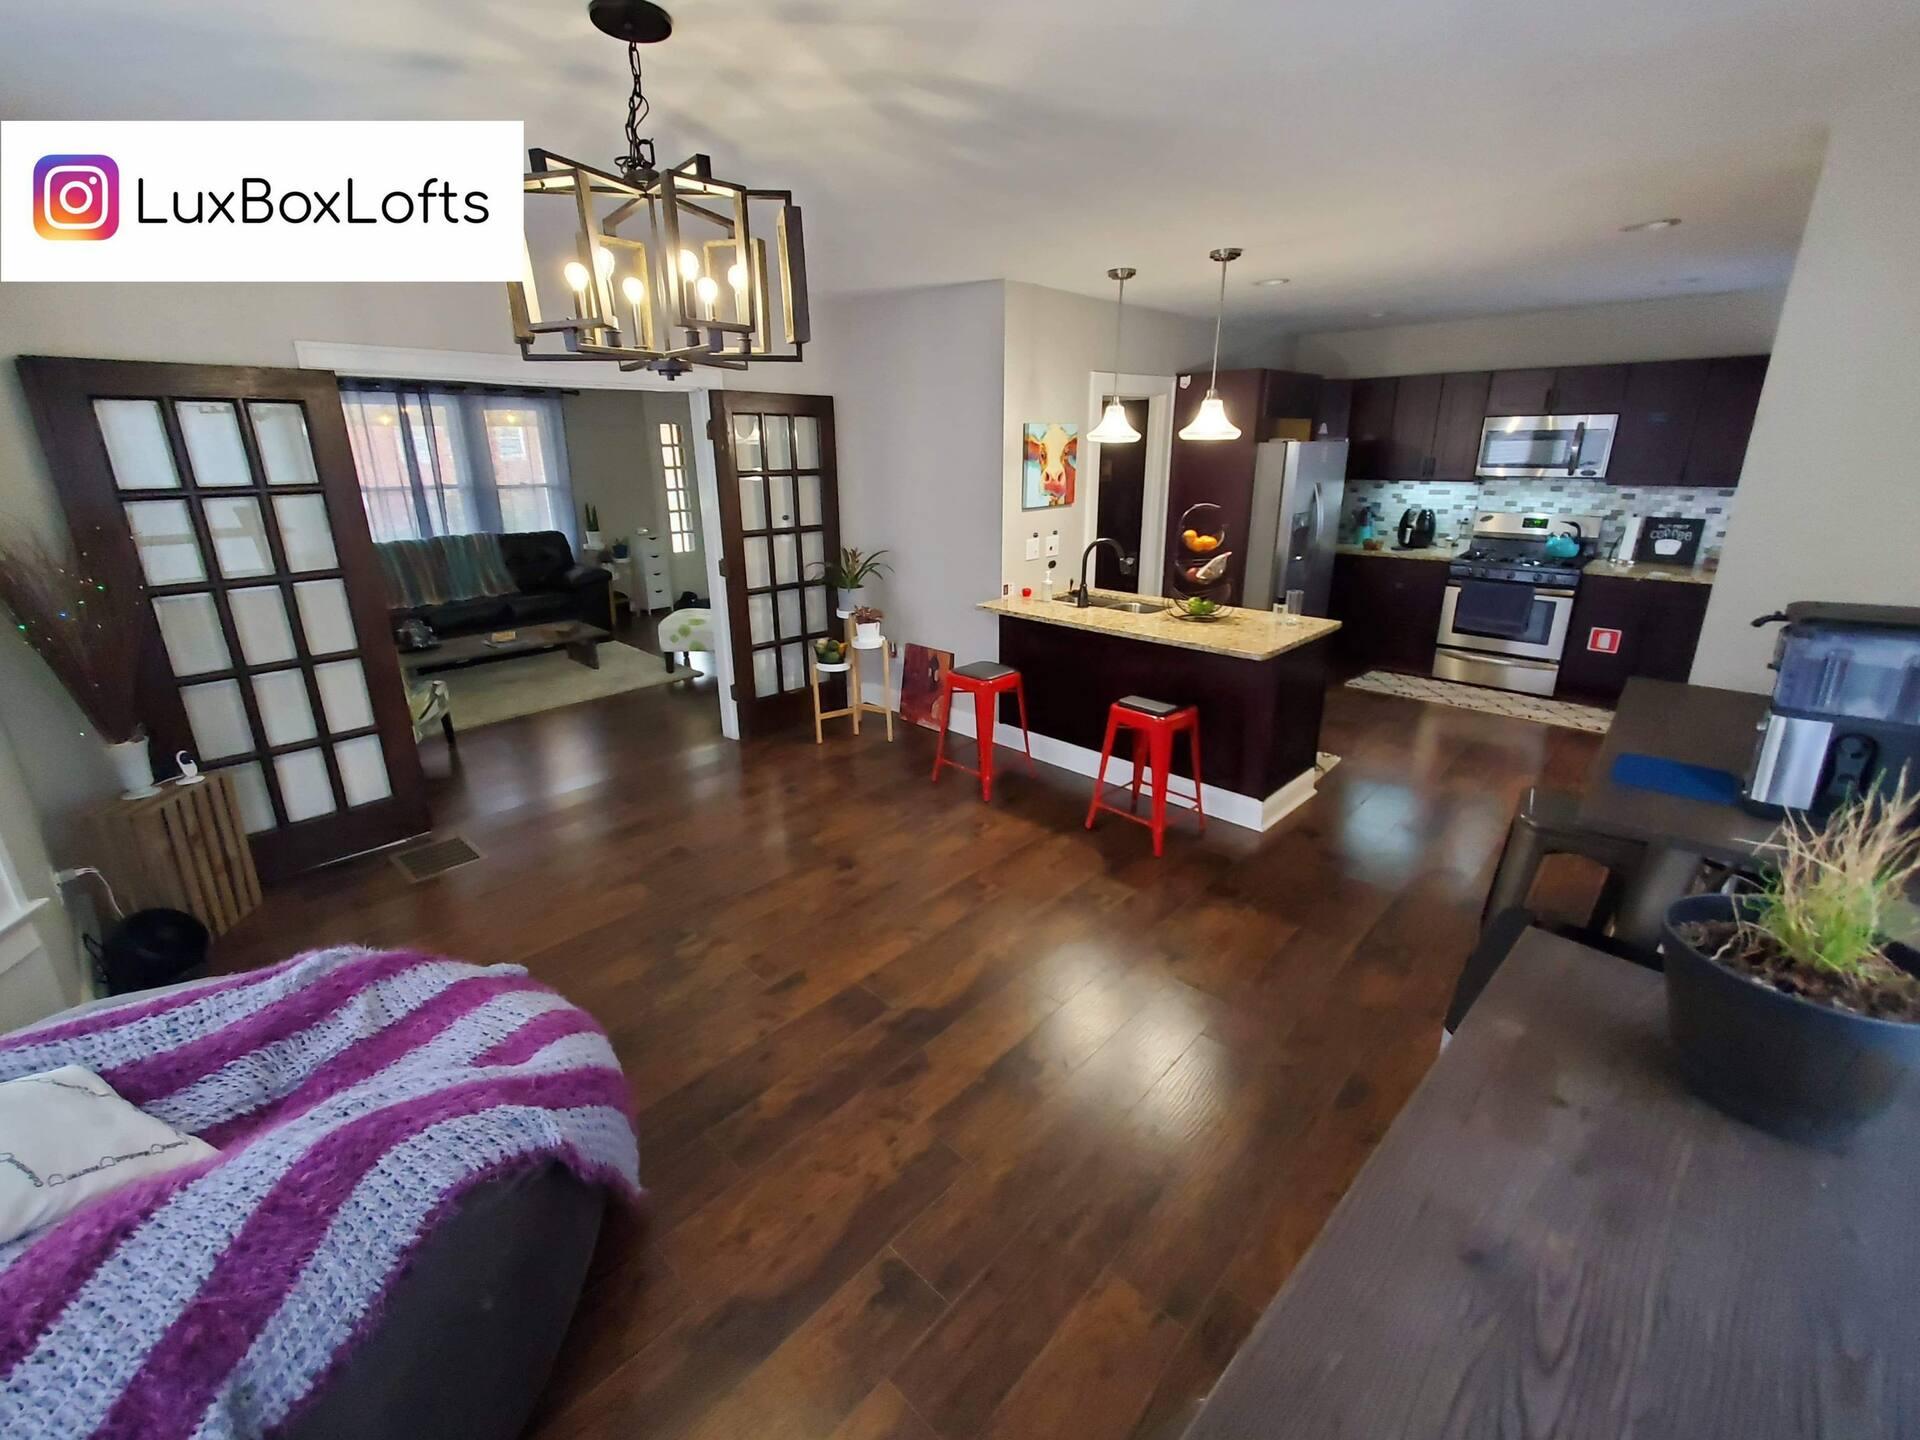 LuxBoxLofts Airbnb Columbus Ohio